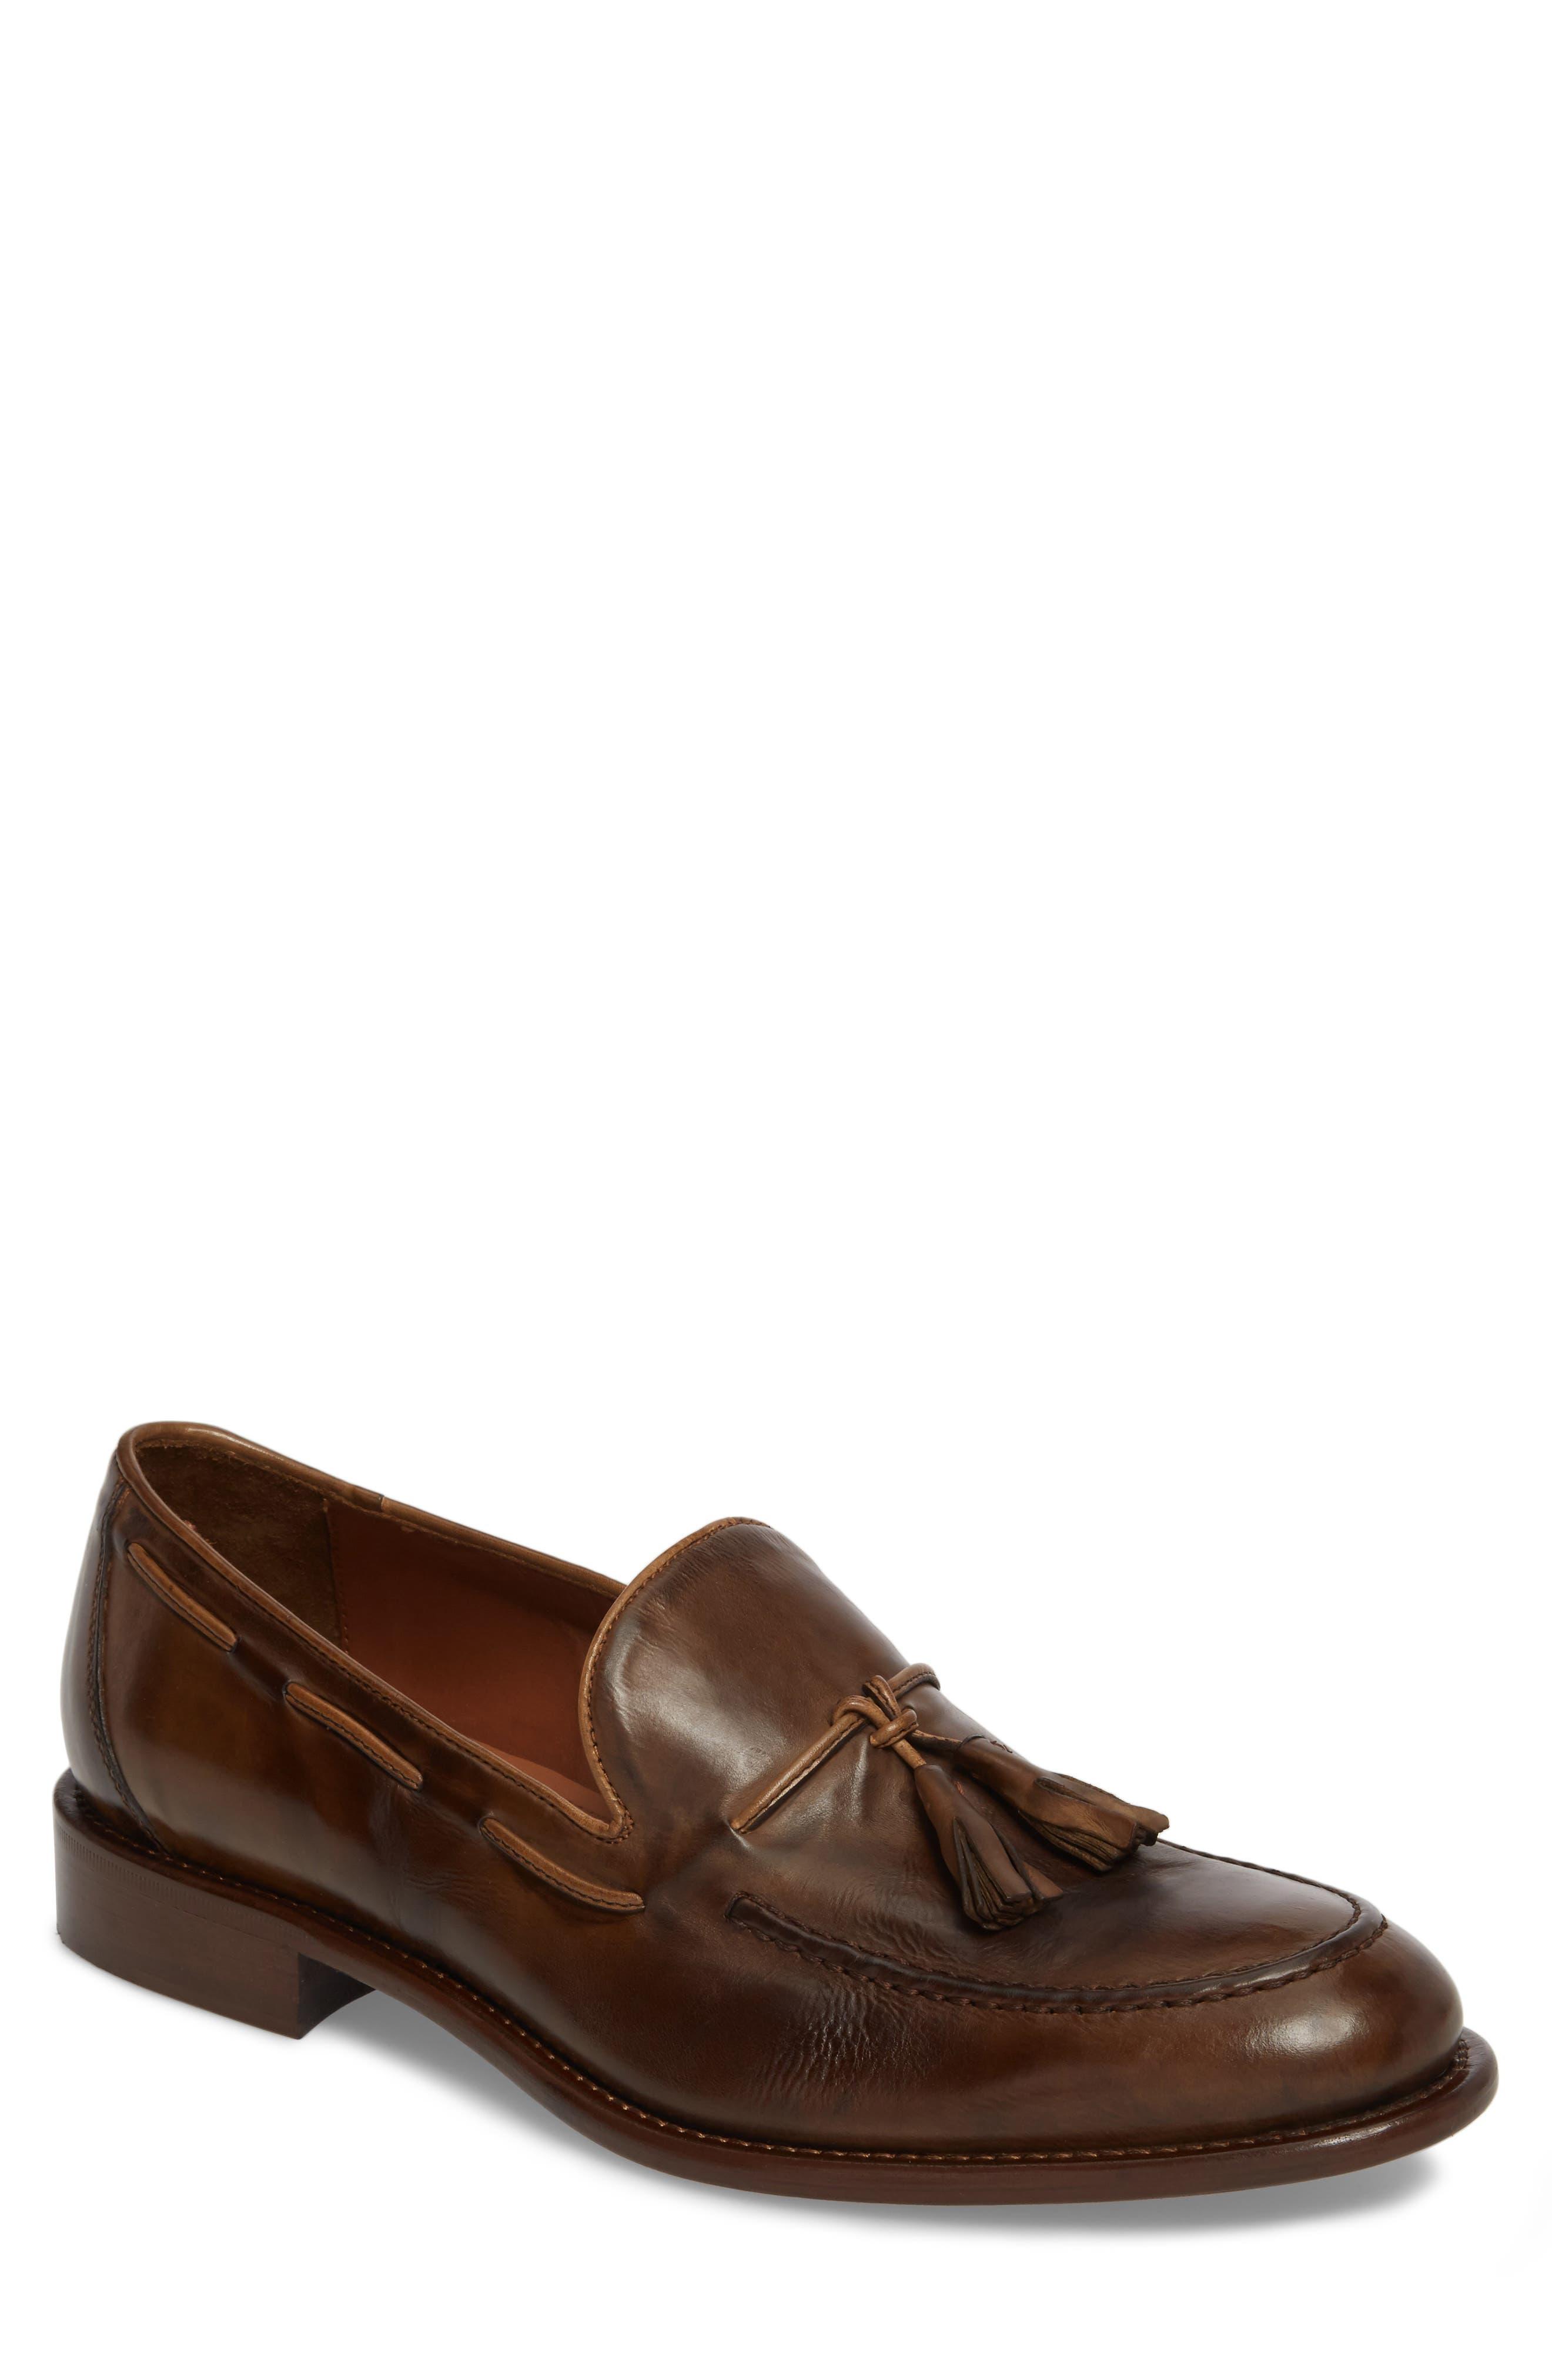 J&M 1850 Bryson Tassel Loafer, Main, color, TOBACCO